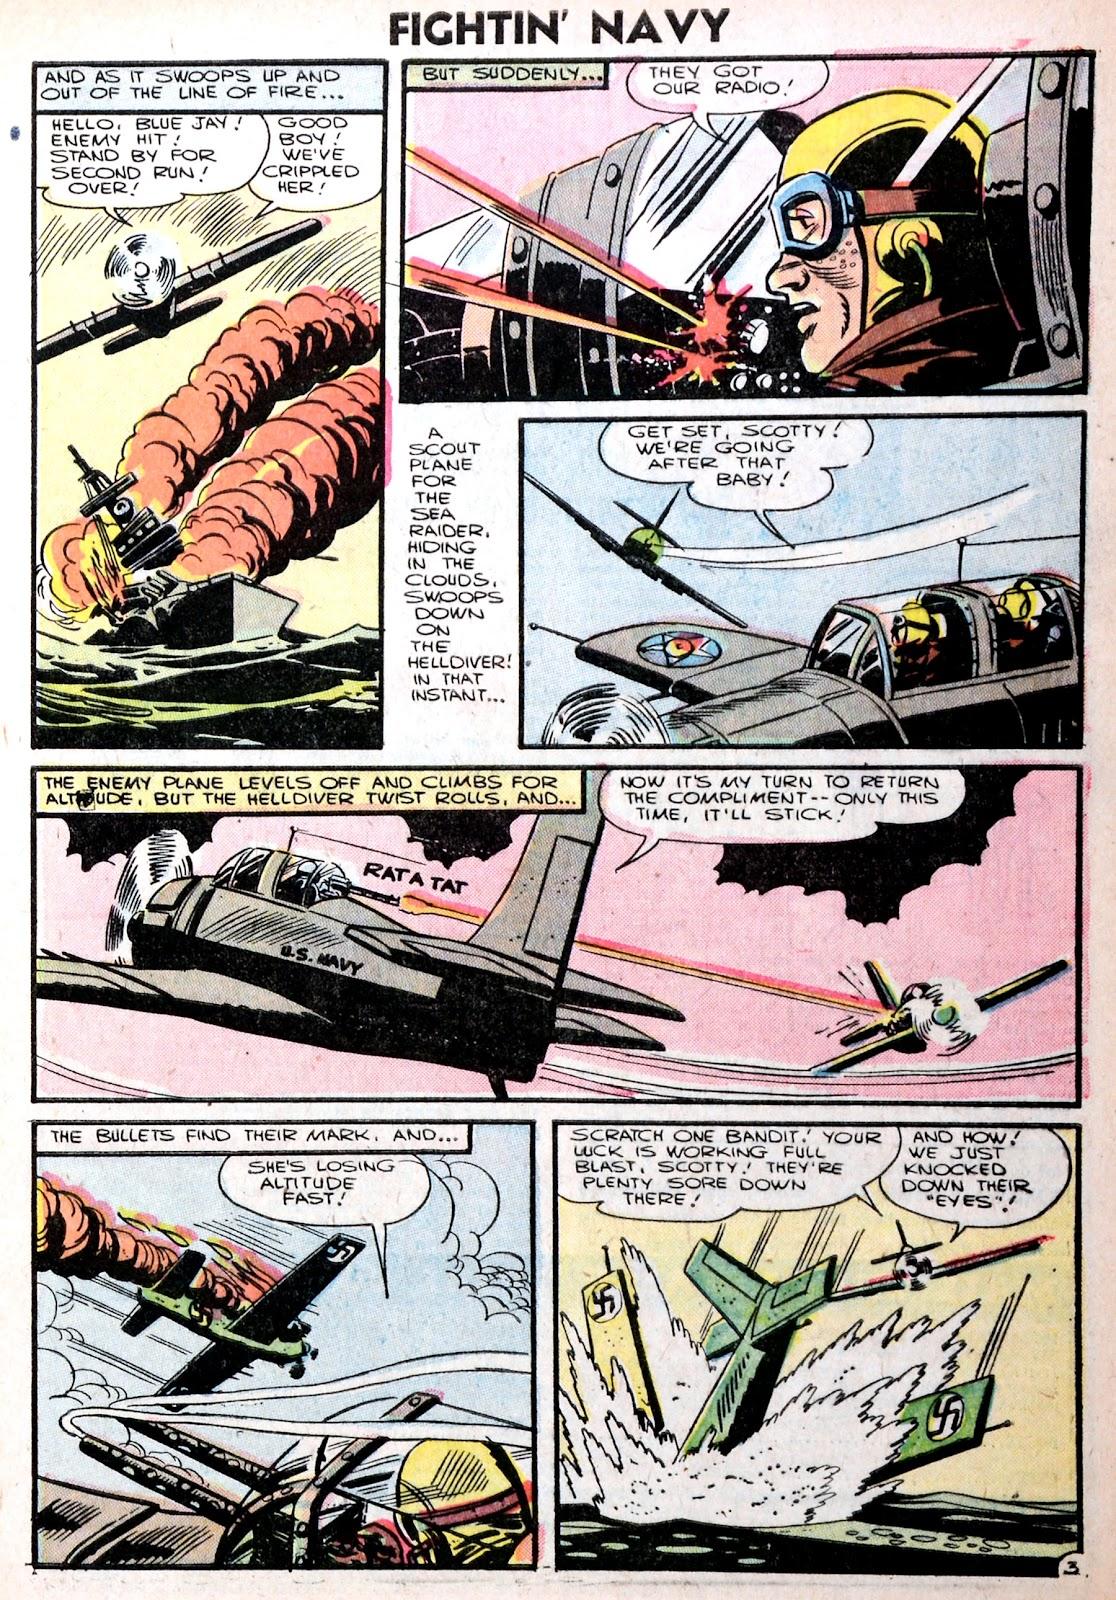 Read online Fightin' Navy comic -  Issue #75 - 5